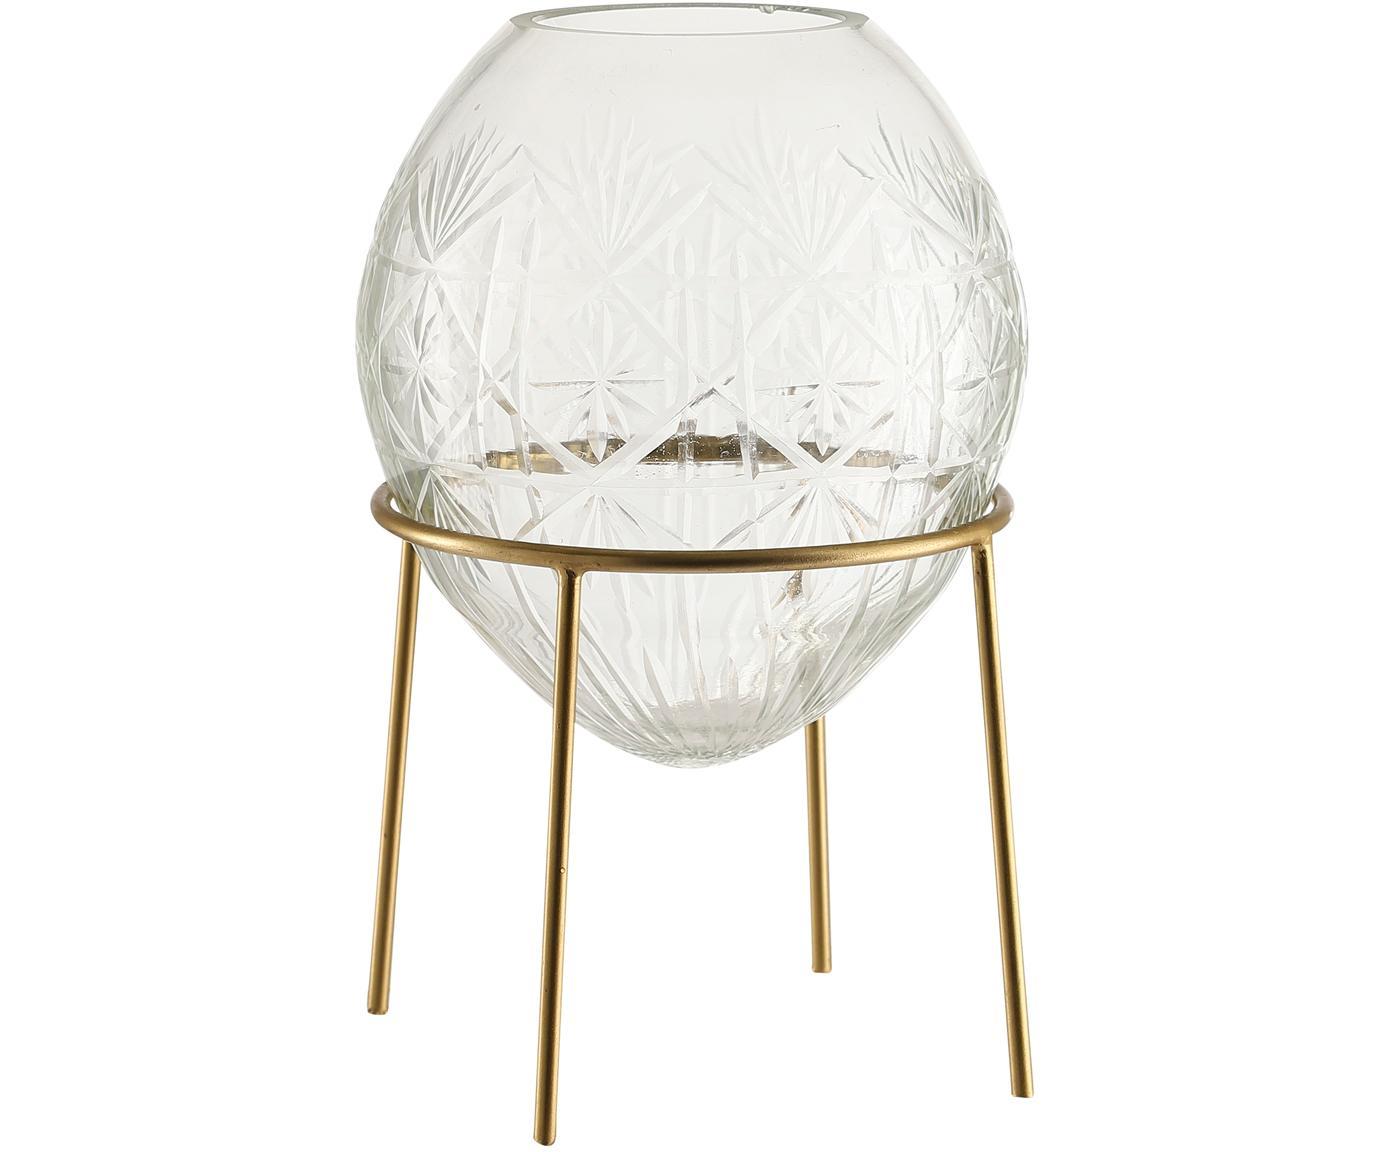 Vaso in vetro Ronda, Struttura: metallo rivestito, Vaso: vetro, Dorato trasparente, Ø 19 x Alt. 22 cm